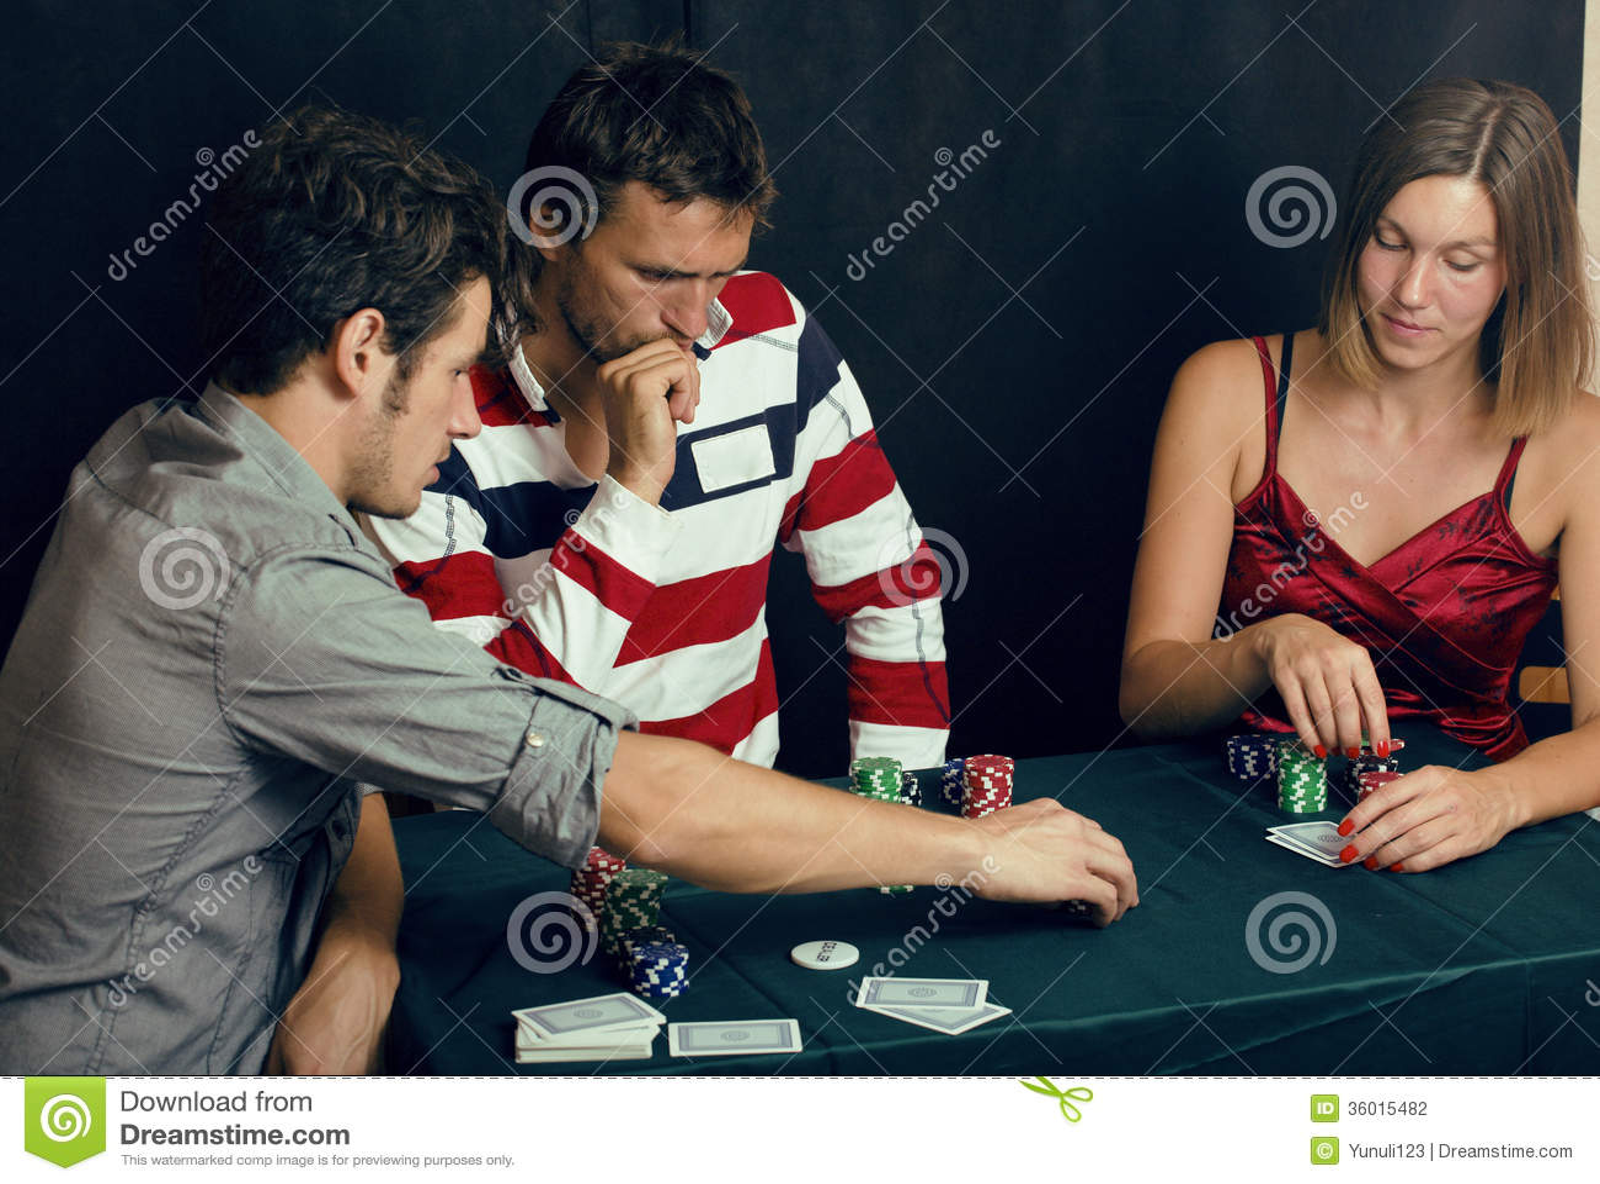 Play Texas Holdem Poker Online Free, Free Casino Slots With Bonus